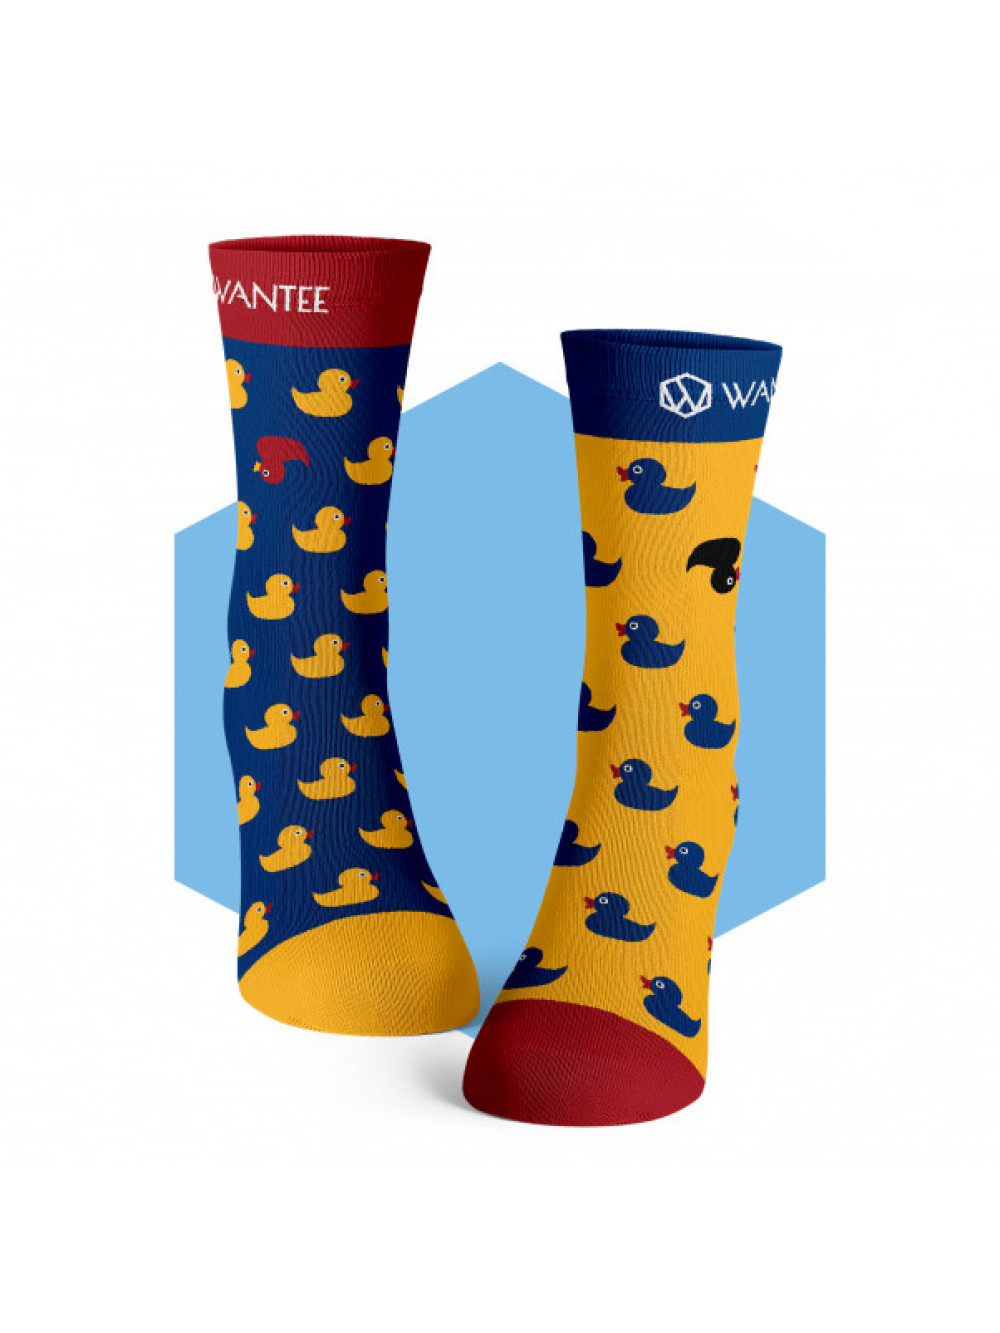 Ponožky Kačičky Wantee